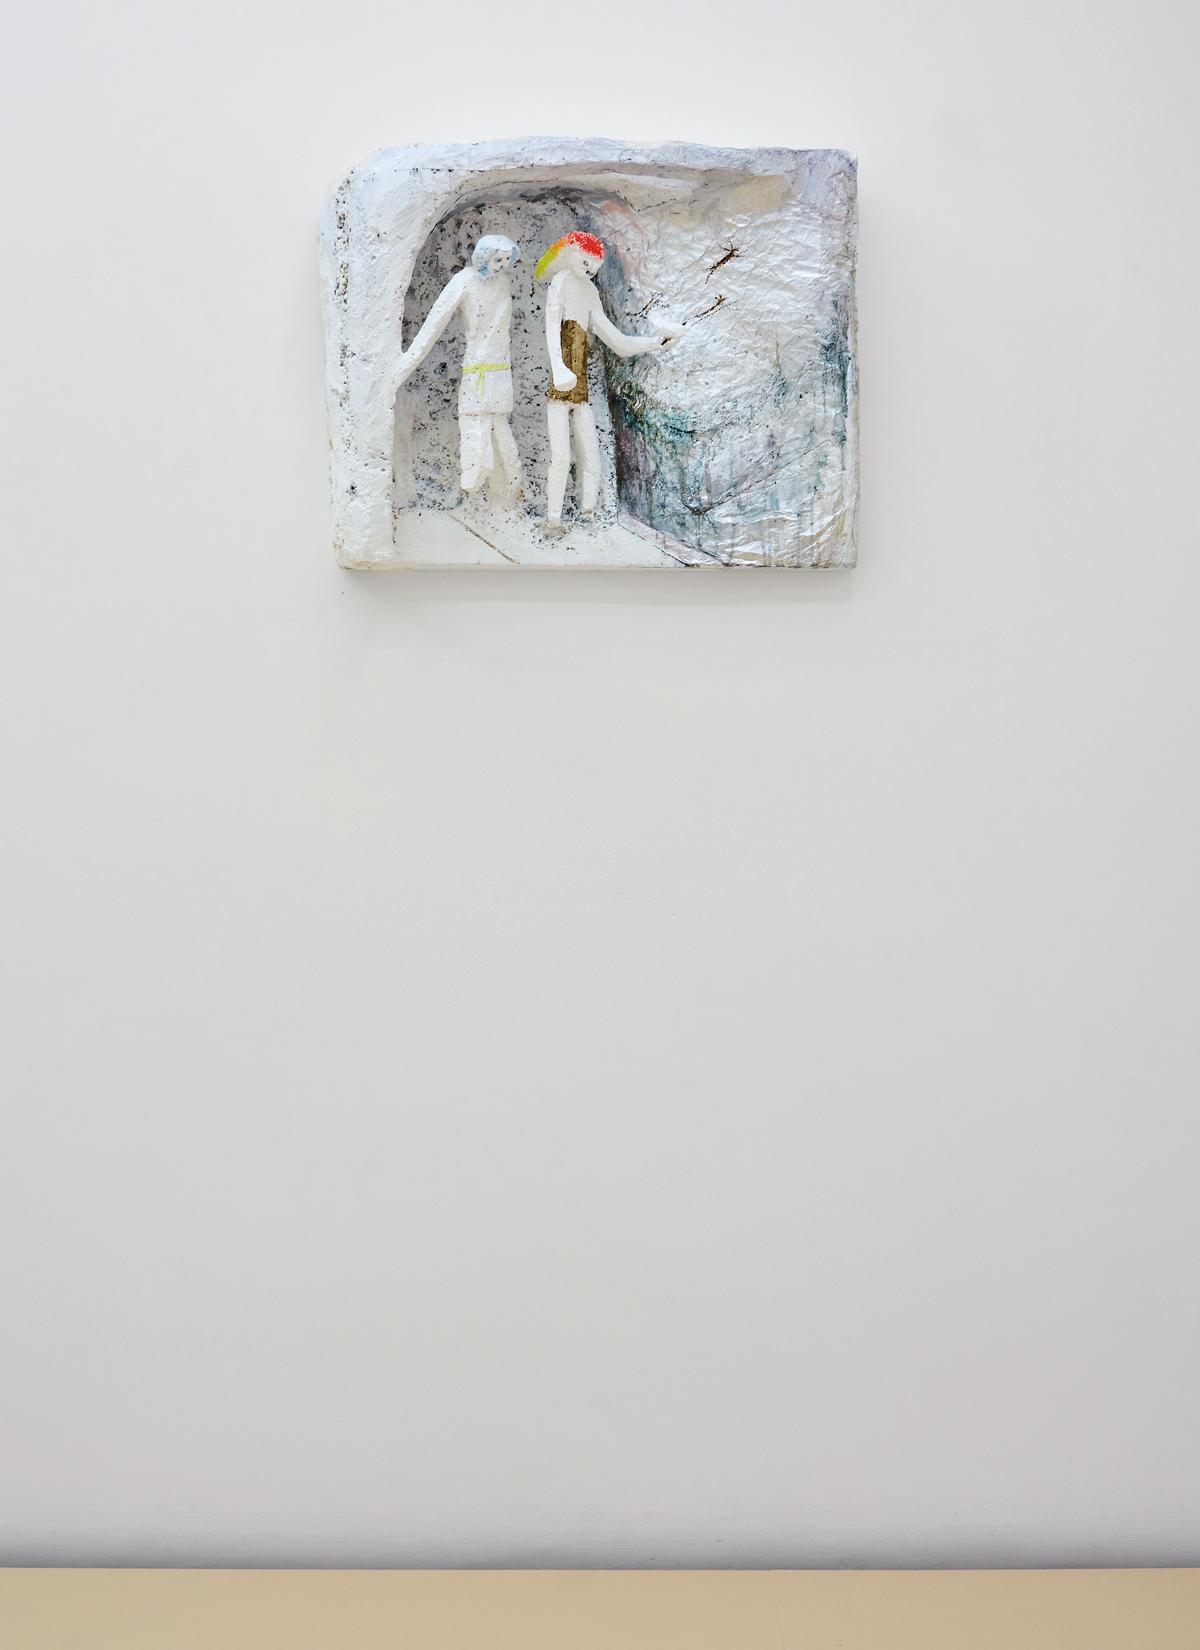 Lin May Saeed, Freundschaft/Friendship relief, 2010. Styrofoam, acrylic paint, foil, 45 x 57 x 15,5 cm